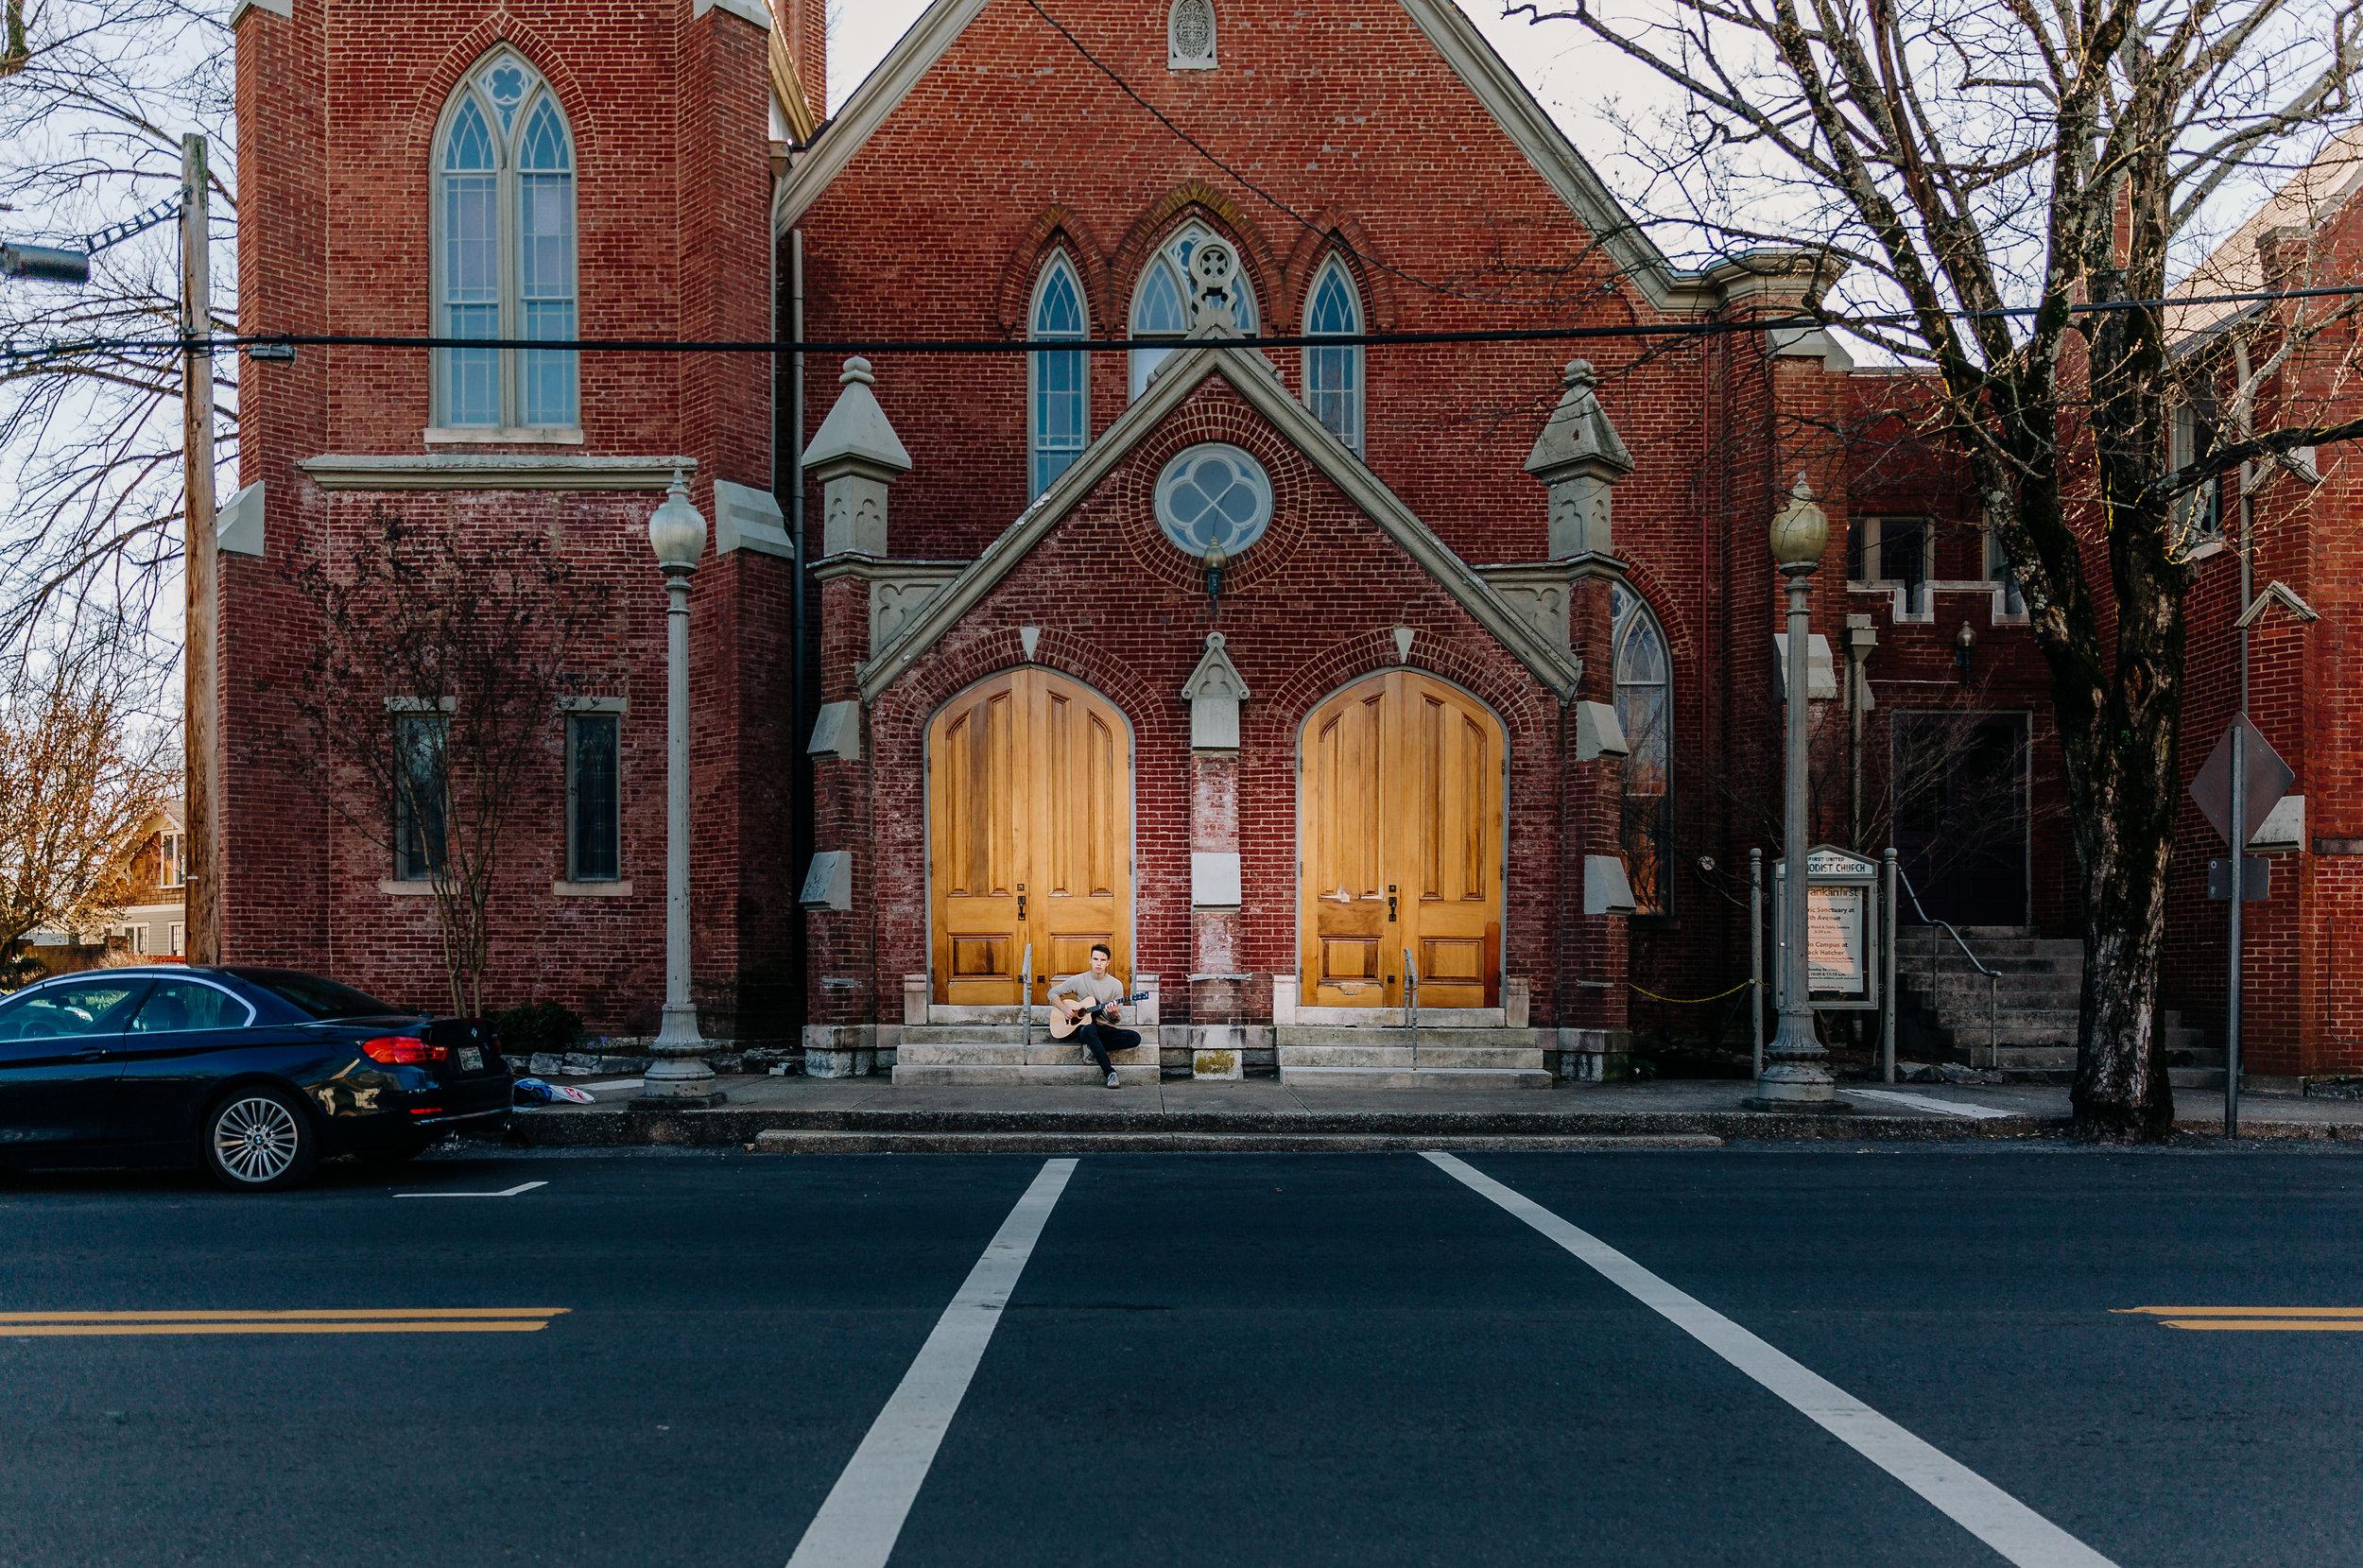 lifestyle-photographer-senior-session-downtown-franklin-16-2.jpg